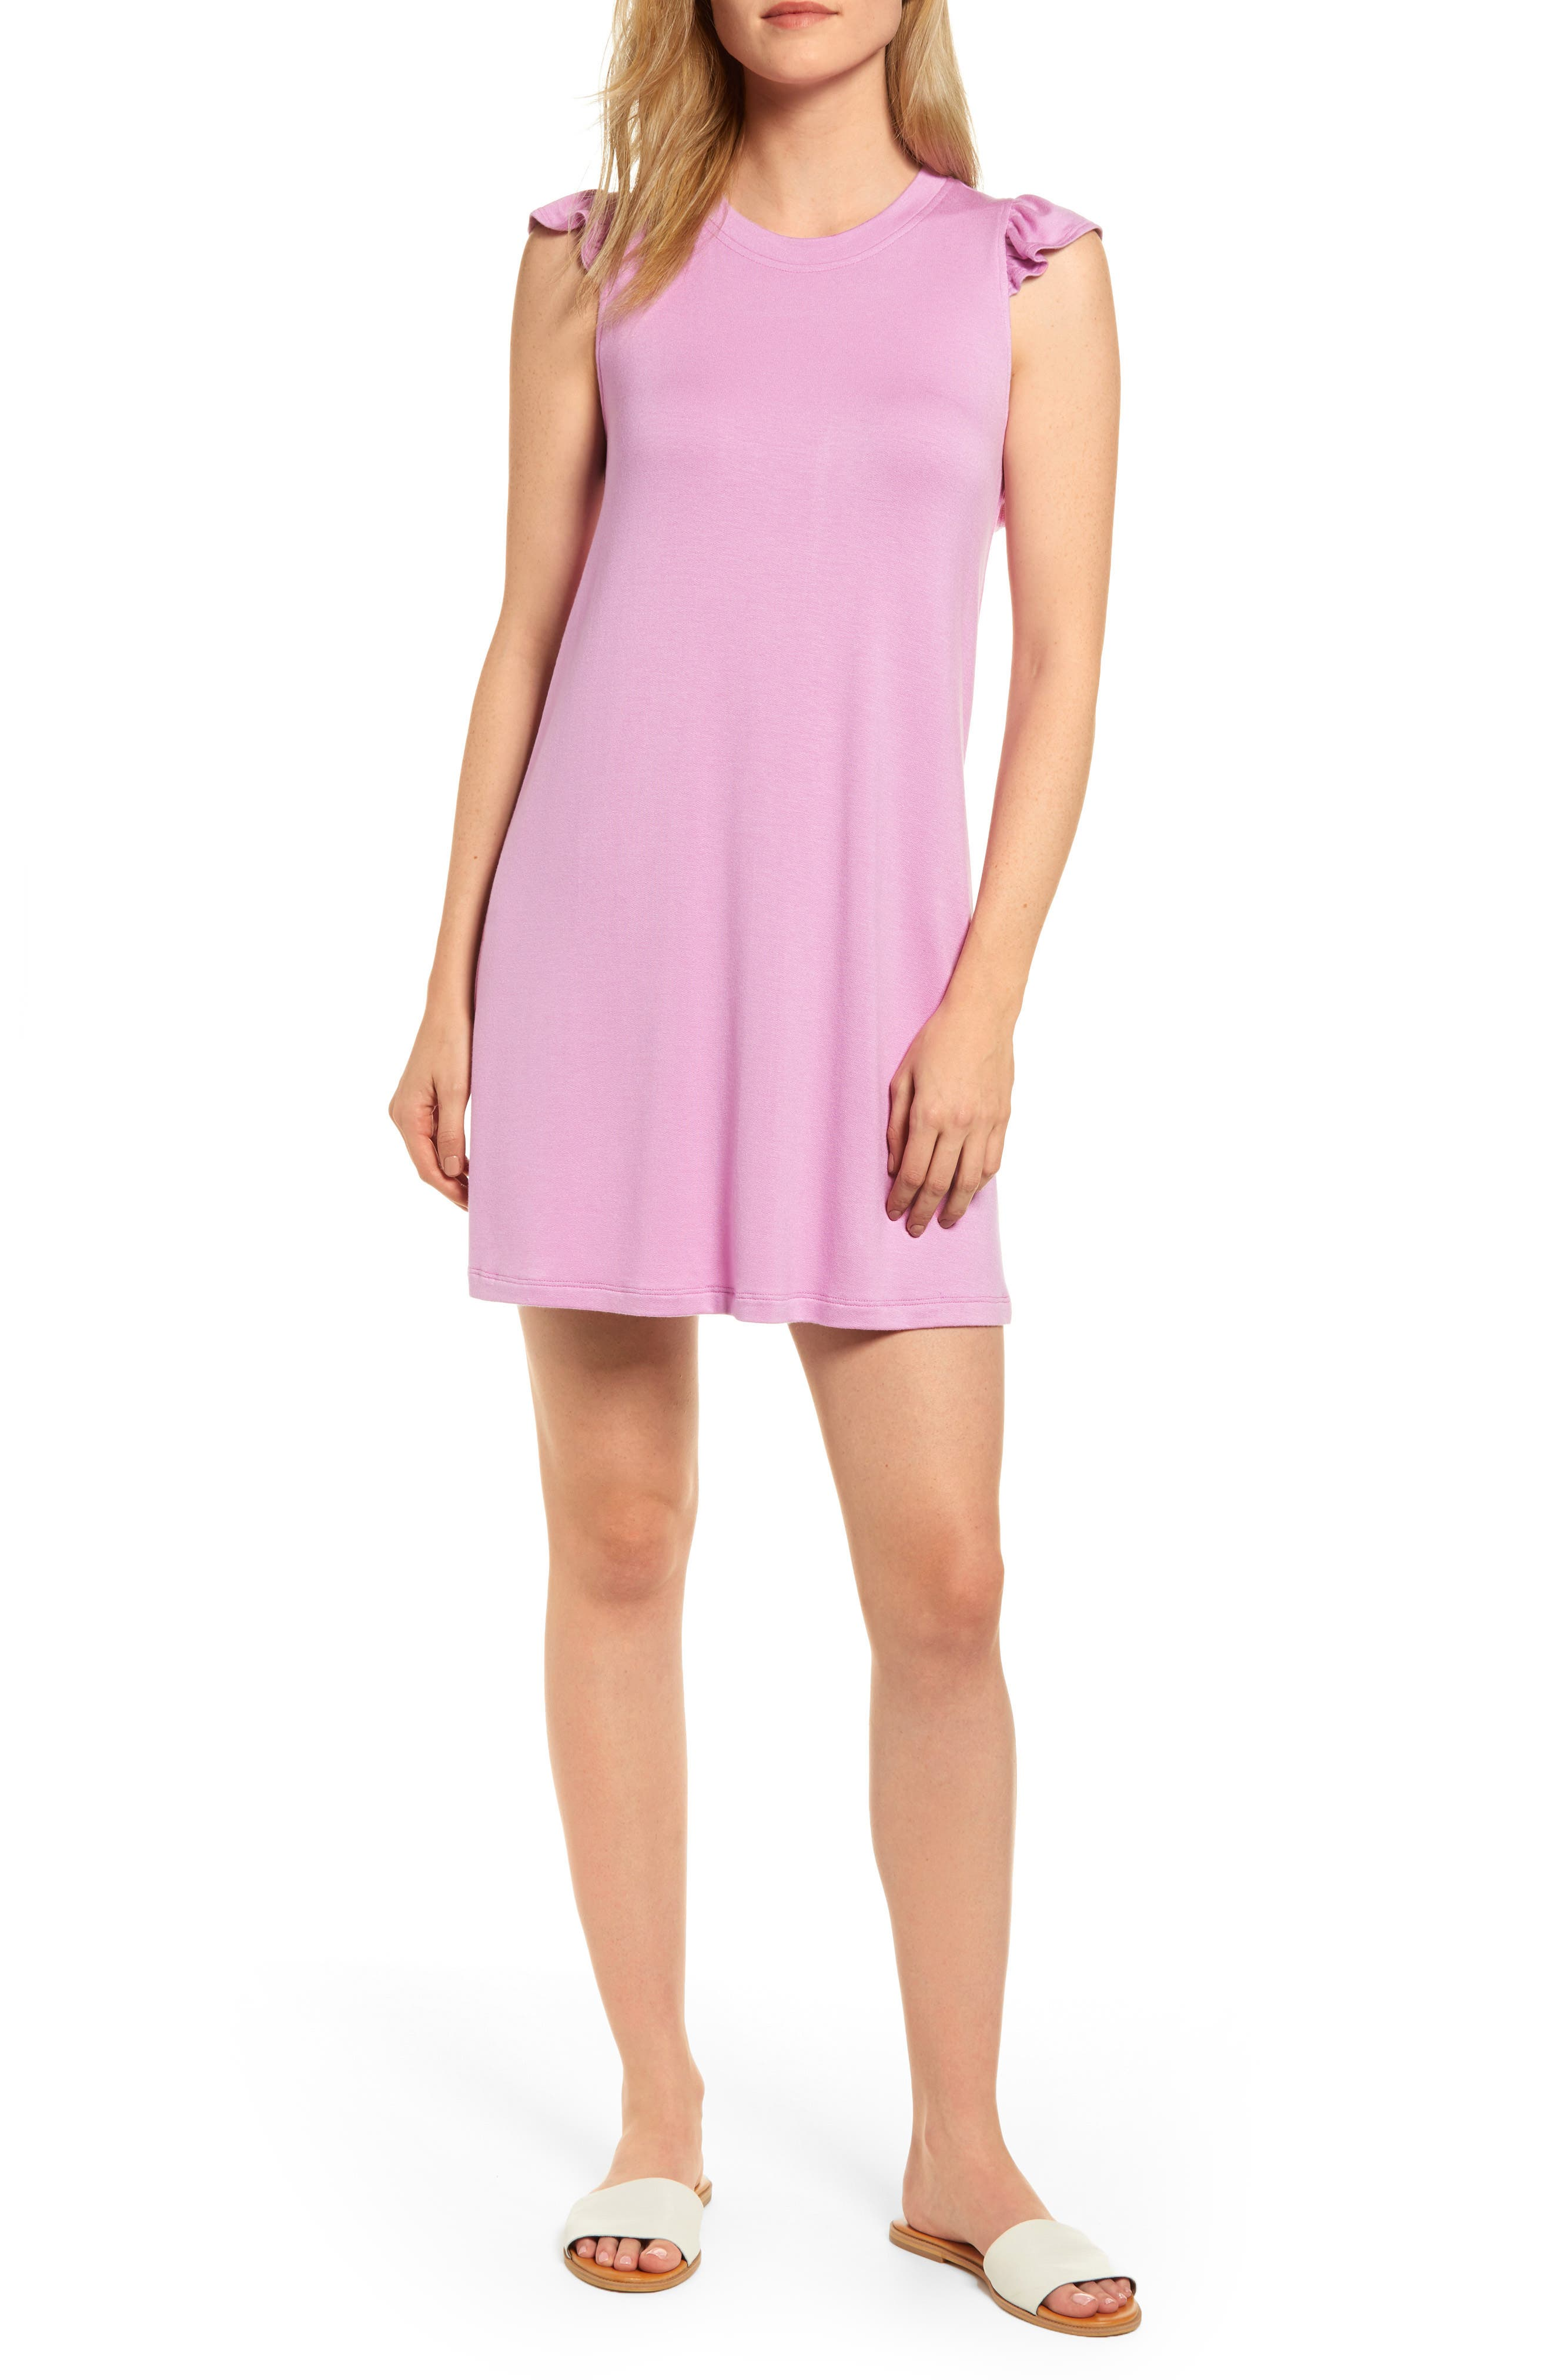 Petite Gibson X Hi Sugarplum! Laguna Soft Jersey Ruffle Back T-Shirt Dress, Pink